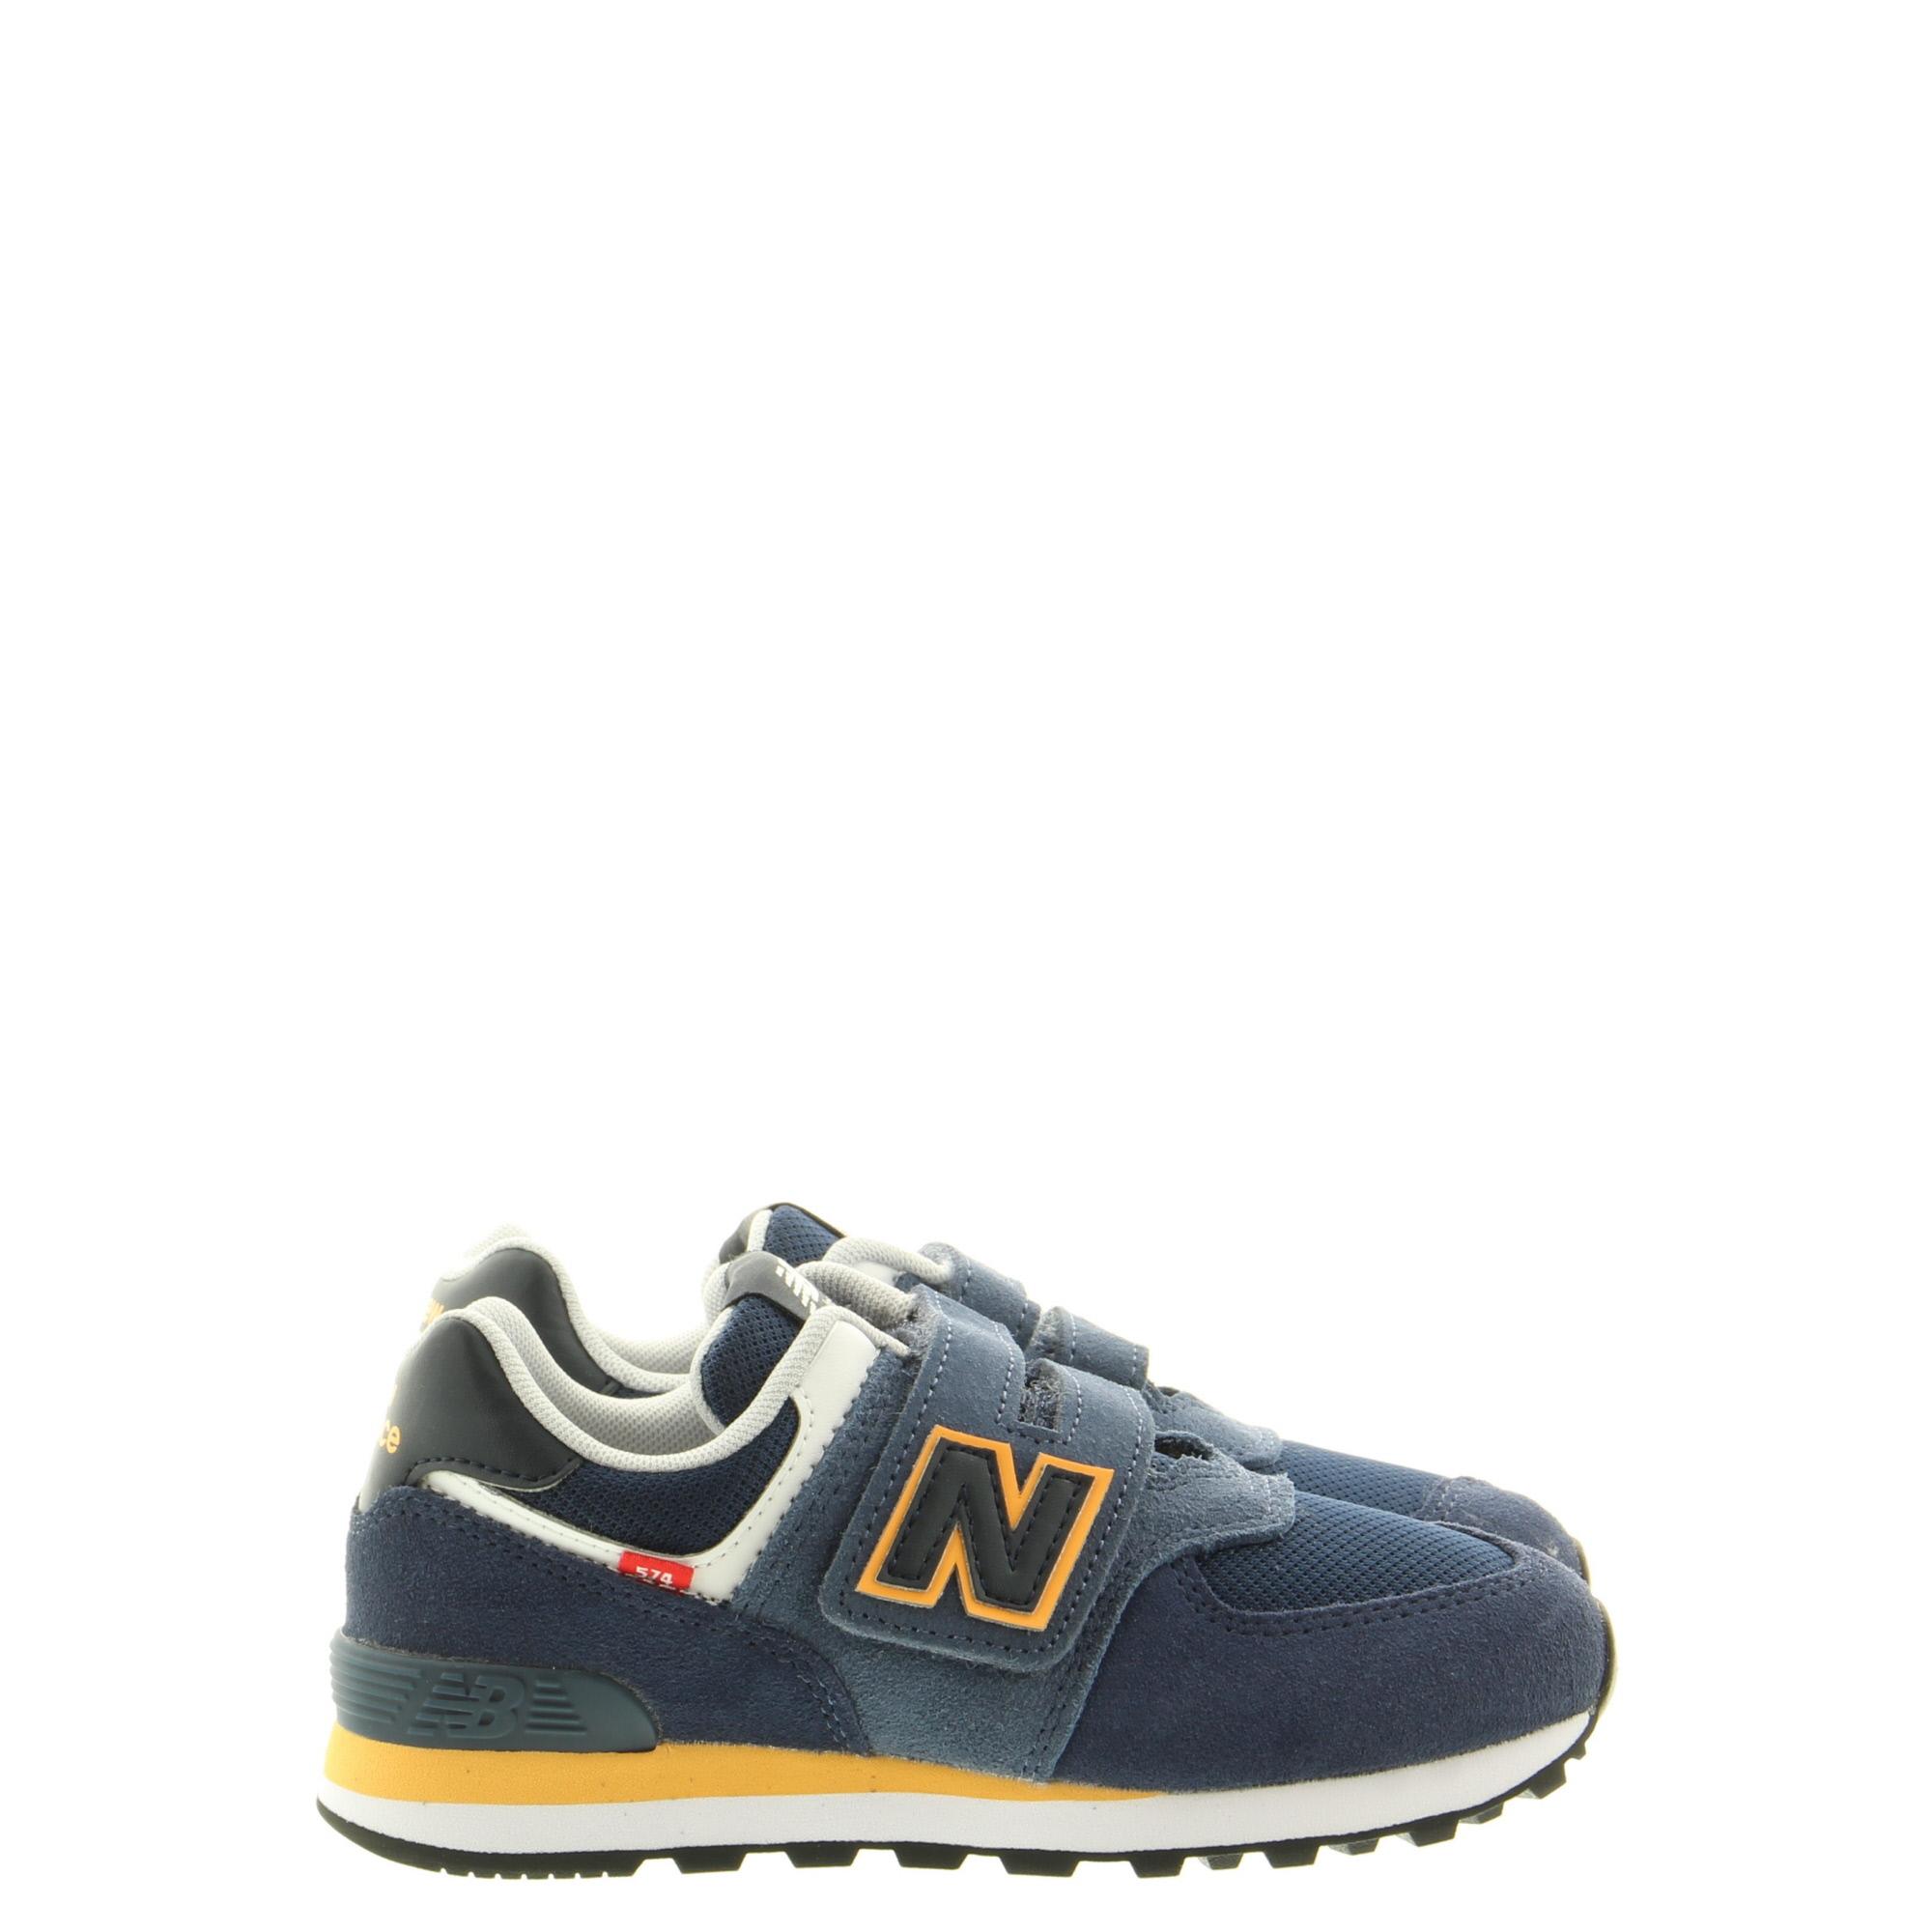 New Balance PV574 SY2 Navy